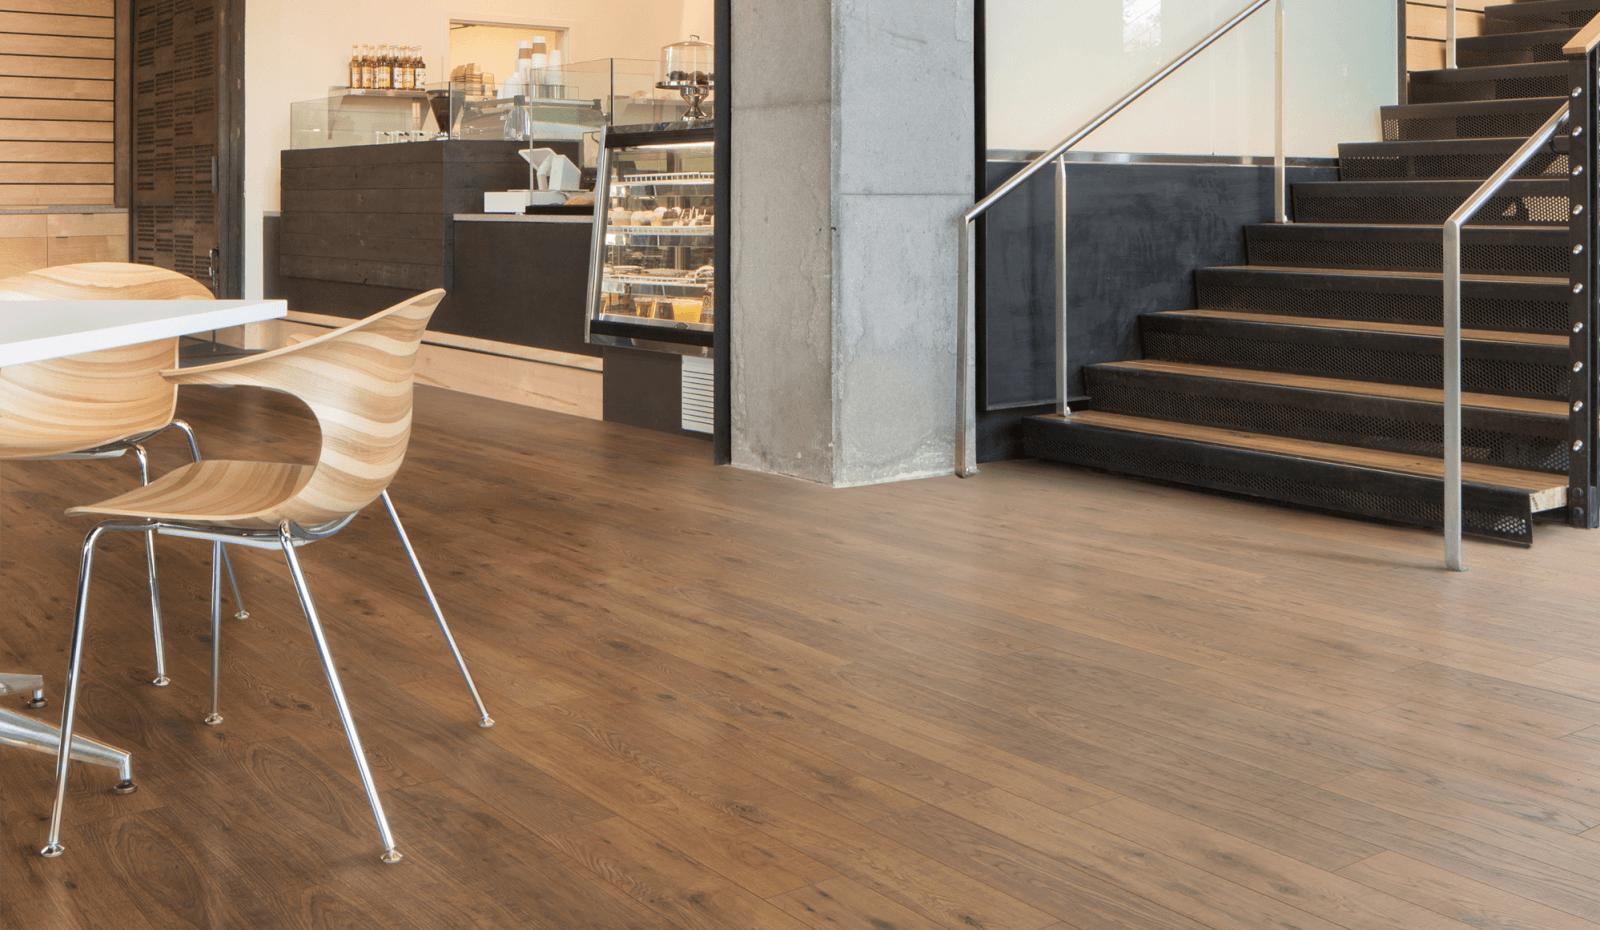 Mohawk group laminate flooring | Flooring by Wilson's Carpet Plus